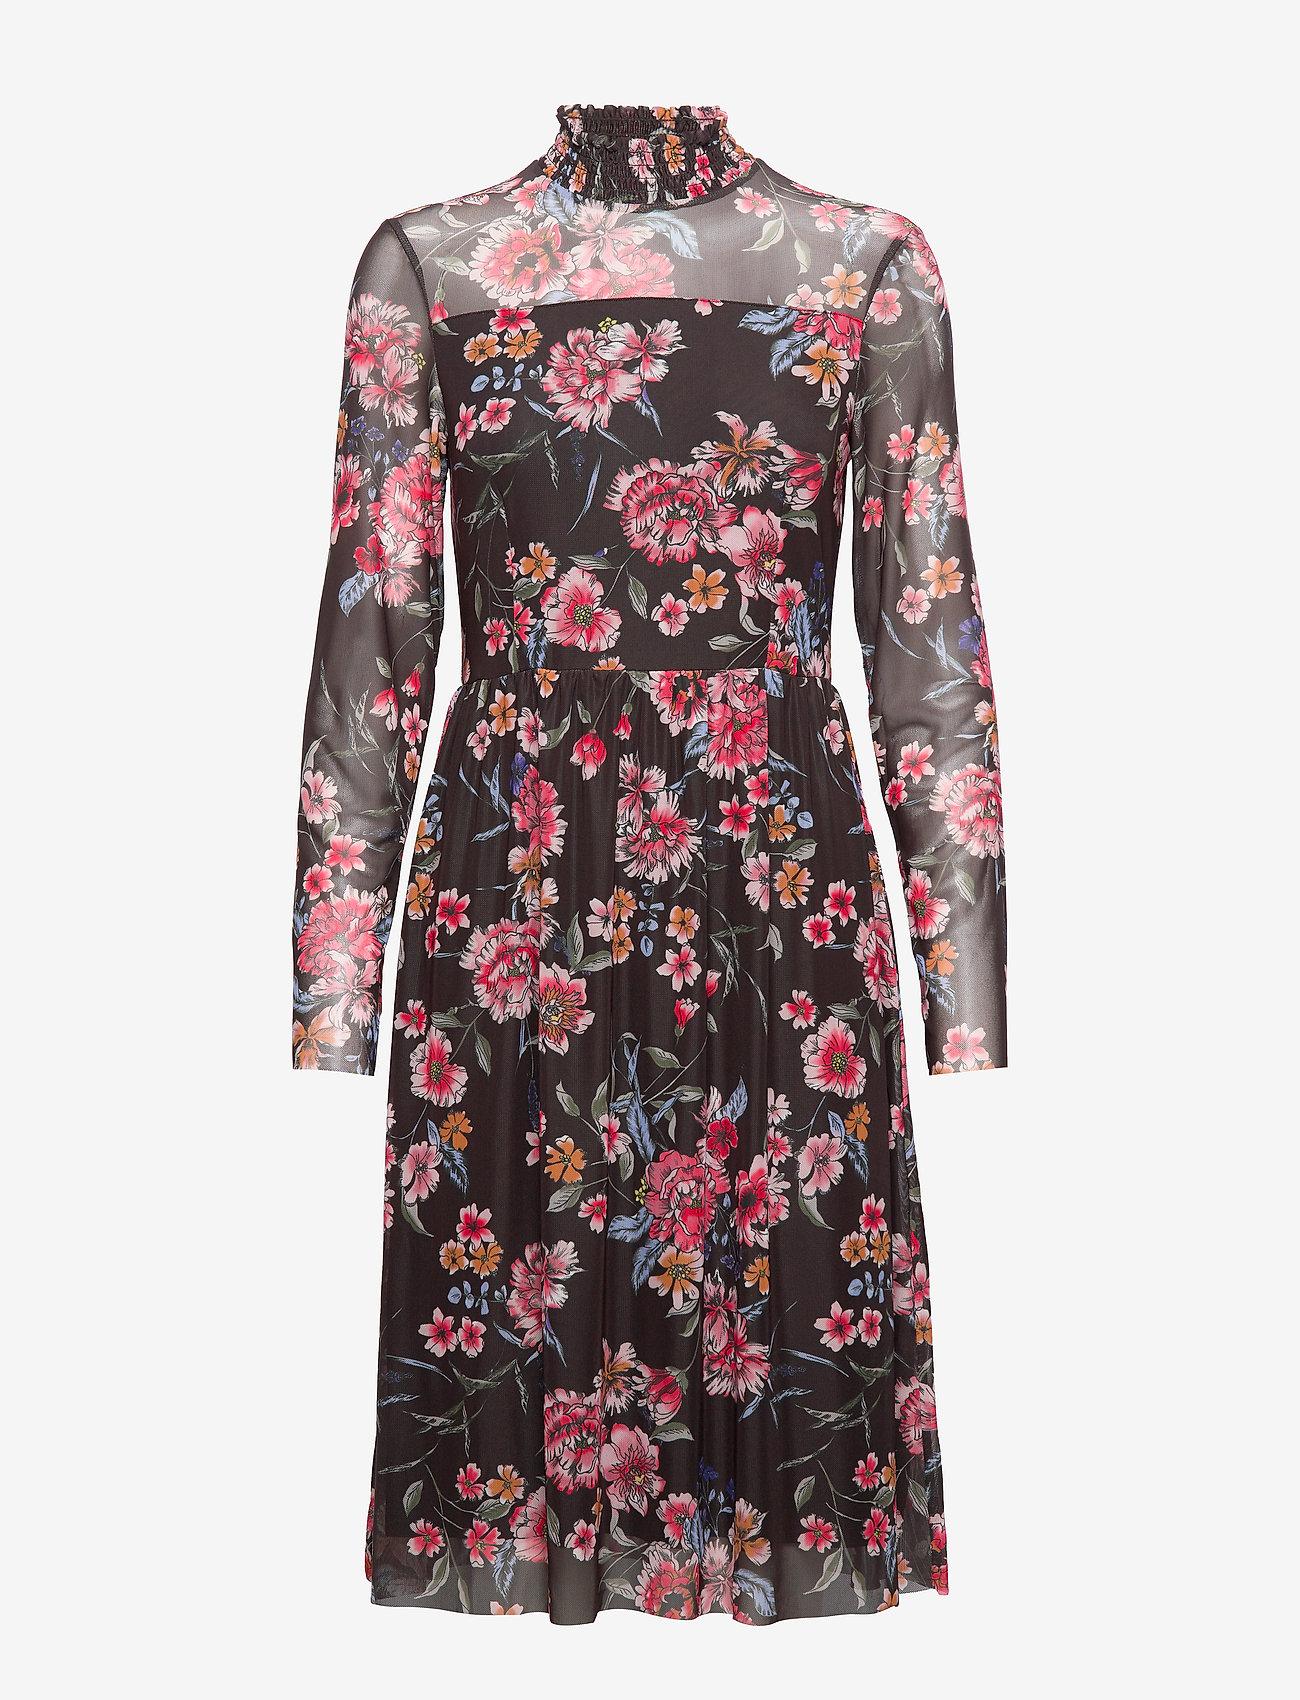 Taifun - DRESS KNITTED FABRIC - midiklänningar - black patterned - 0